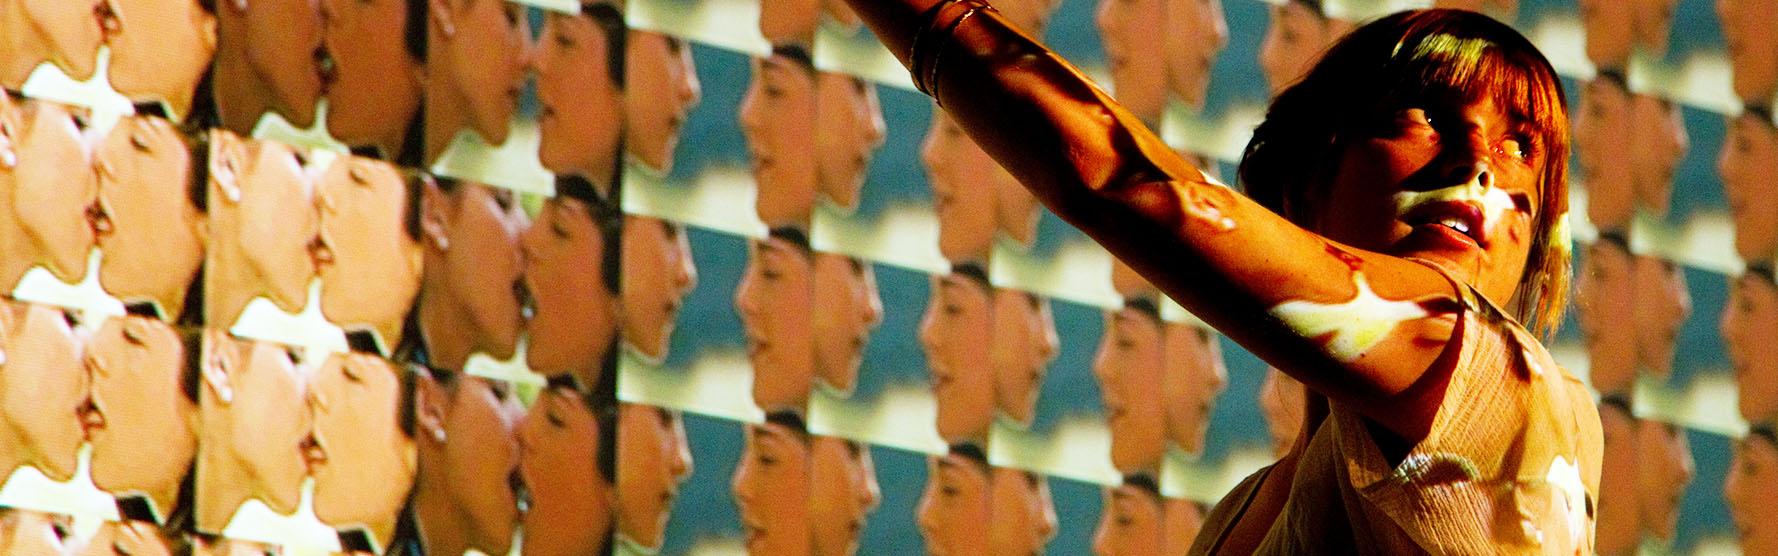 Megalodemocrat: The Public Art Of Rafael Lozano-Hemmer